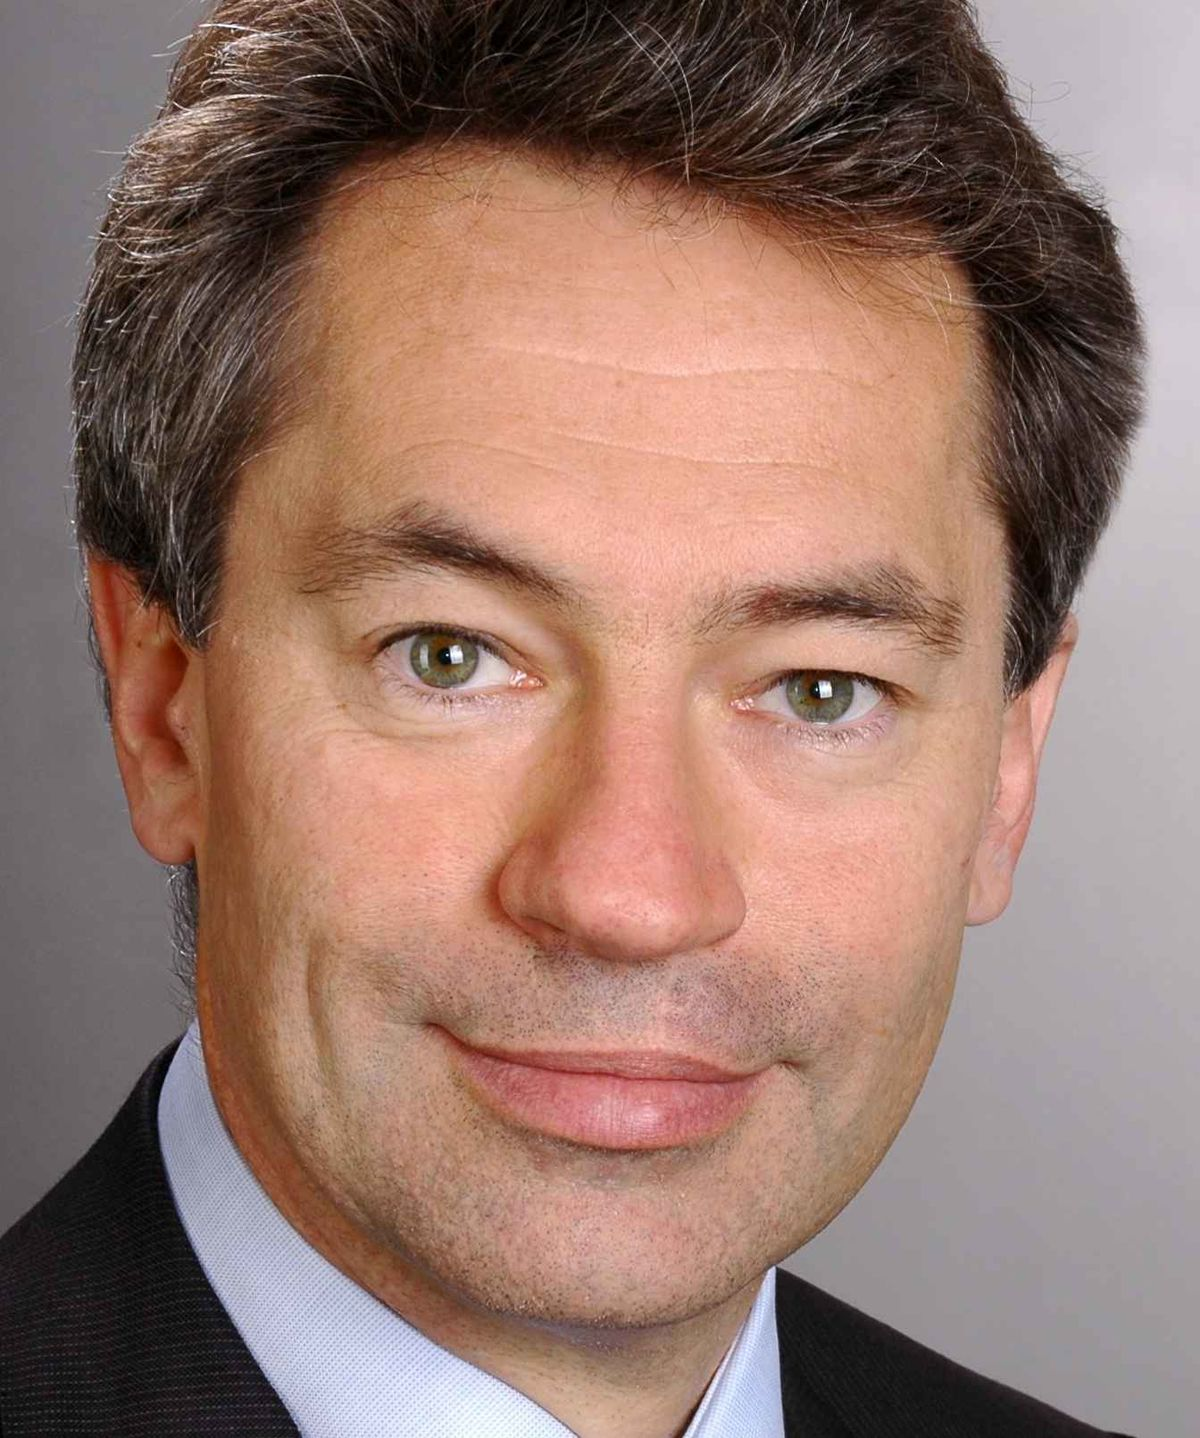 Holger Lode – Wikipedia